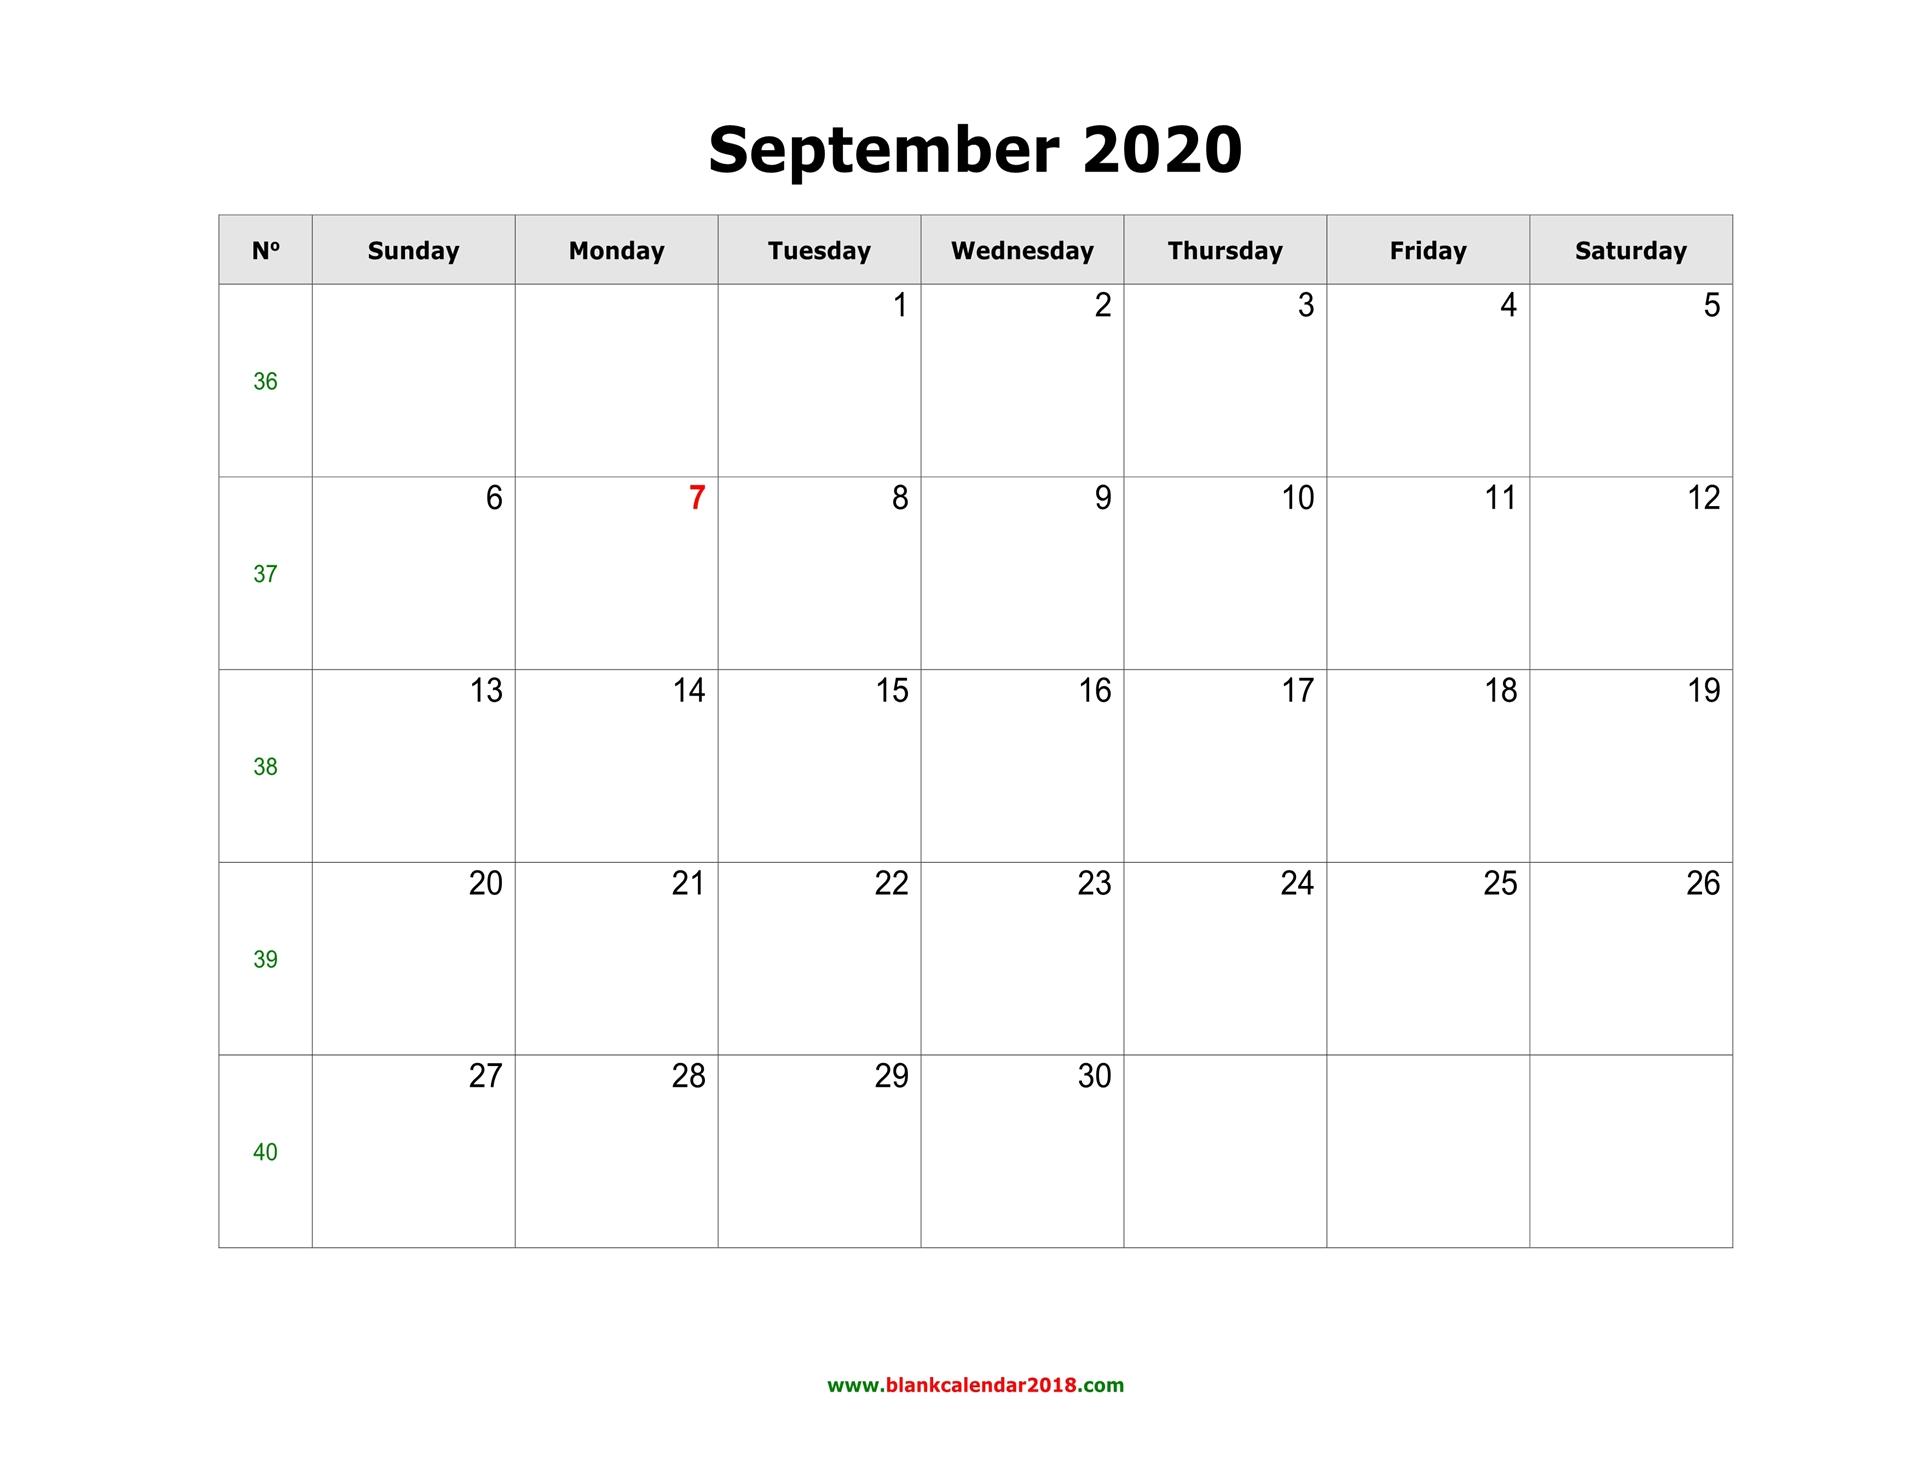 Blank Template Calendar from www.blankcalendar2018.com